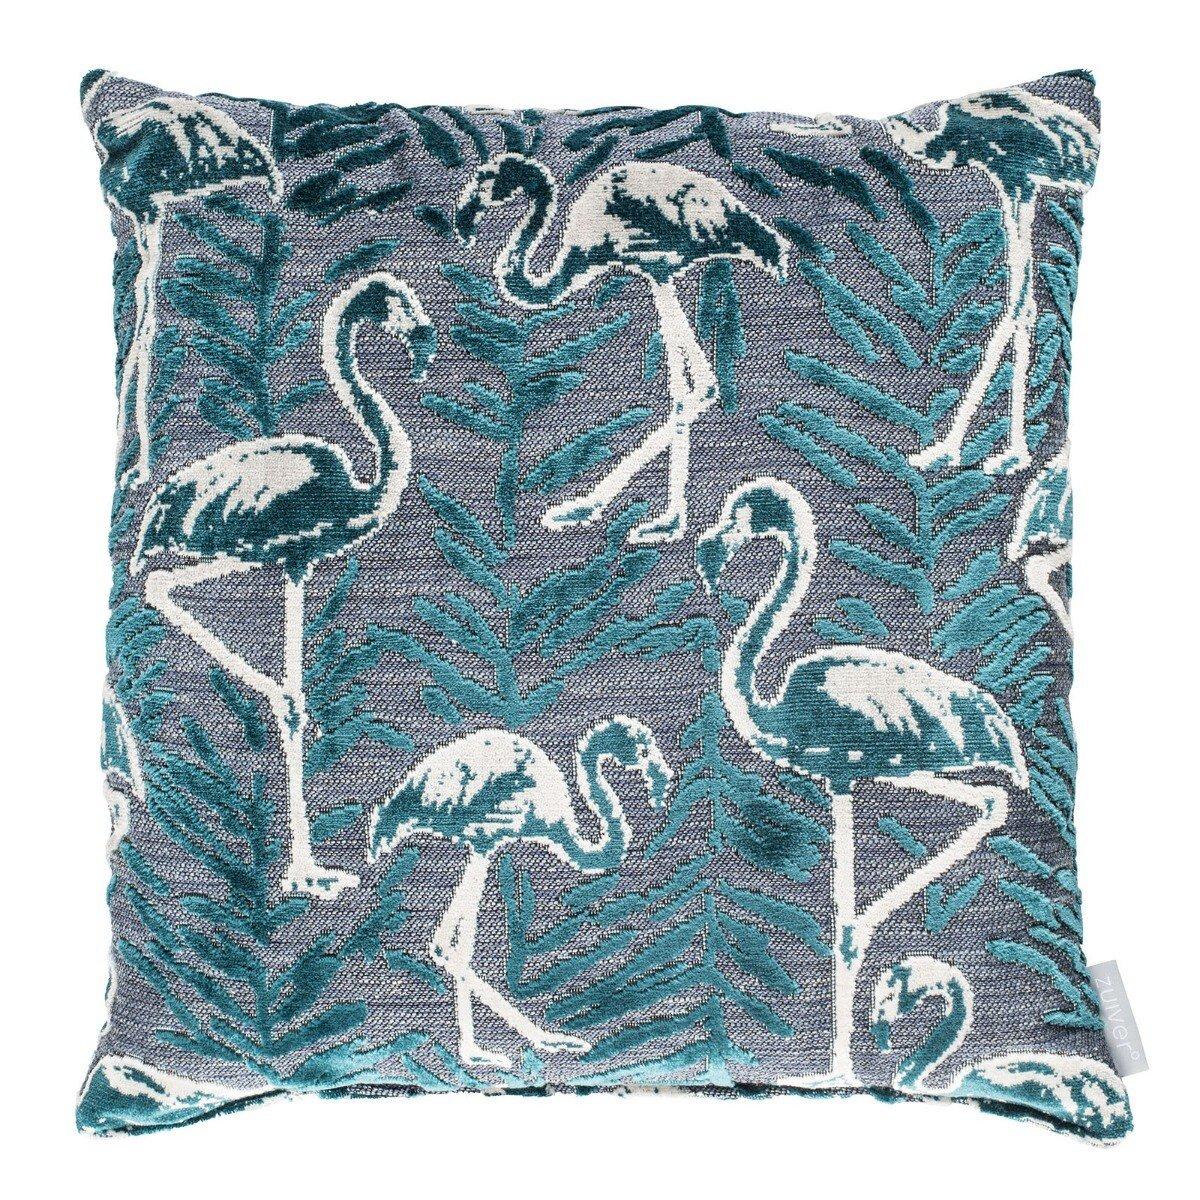 Zuiver kussen Kylie Flamingo Petrol blauw 45 x 45